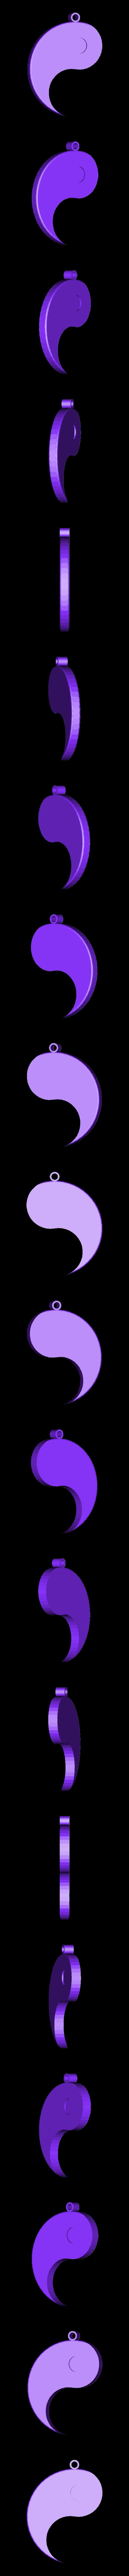 yin.stl Download free STL file yin yang • Object to 3D print, Nahskaved